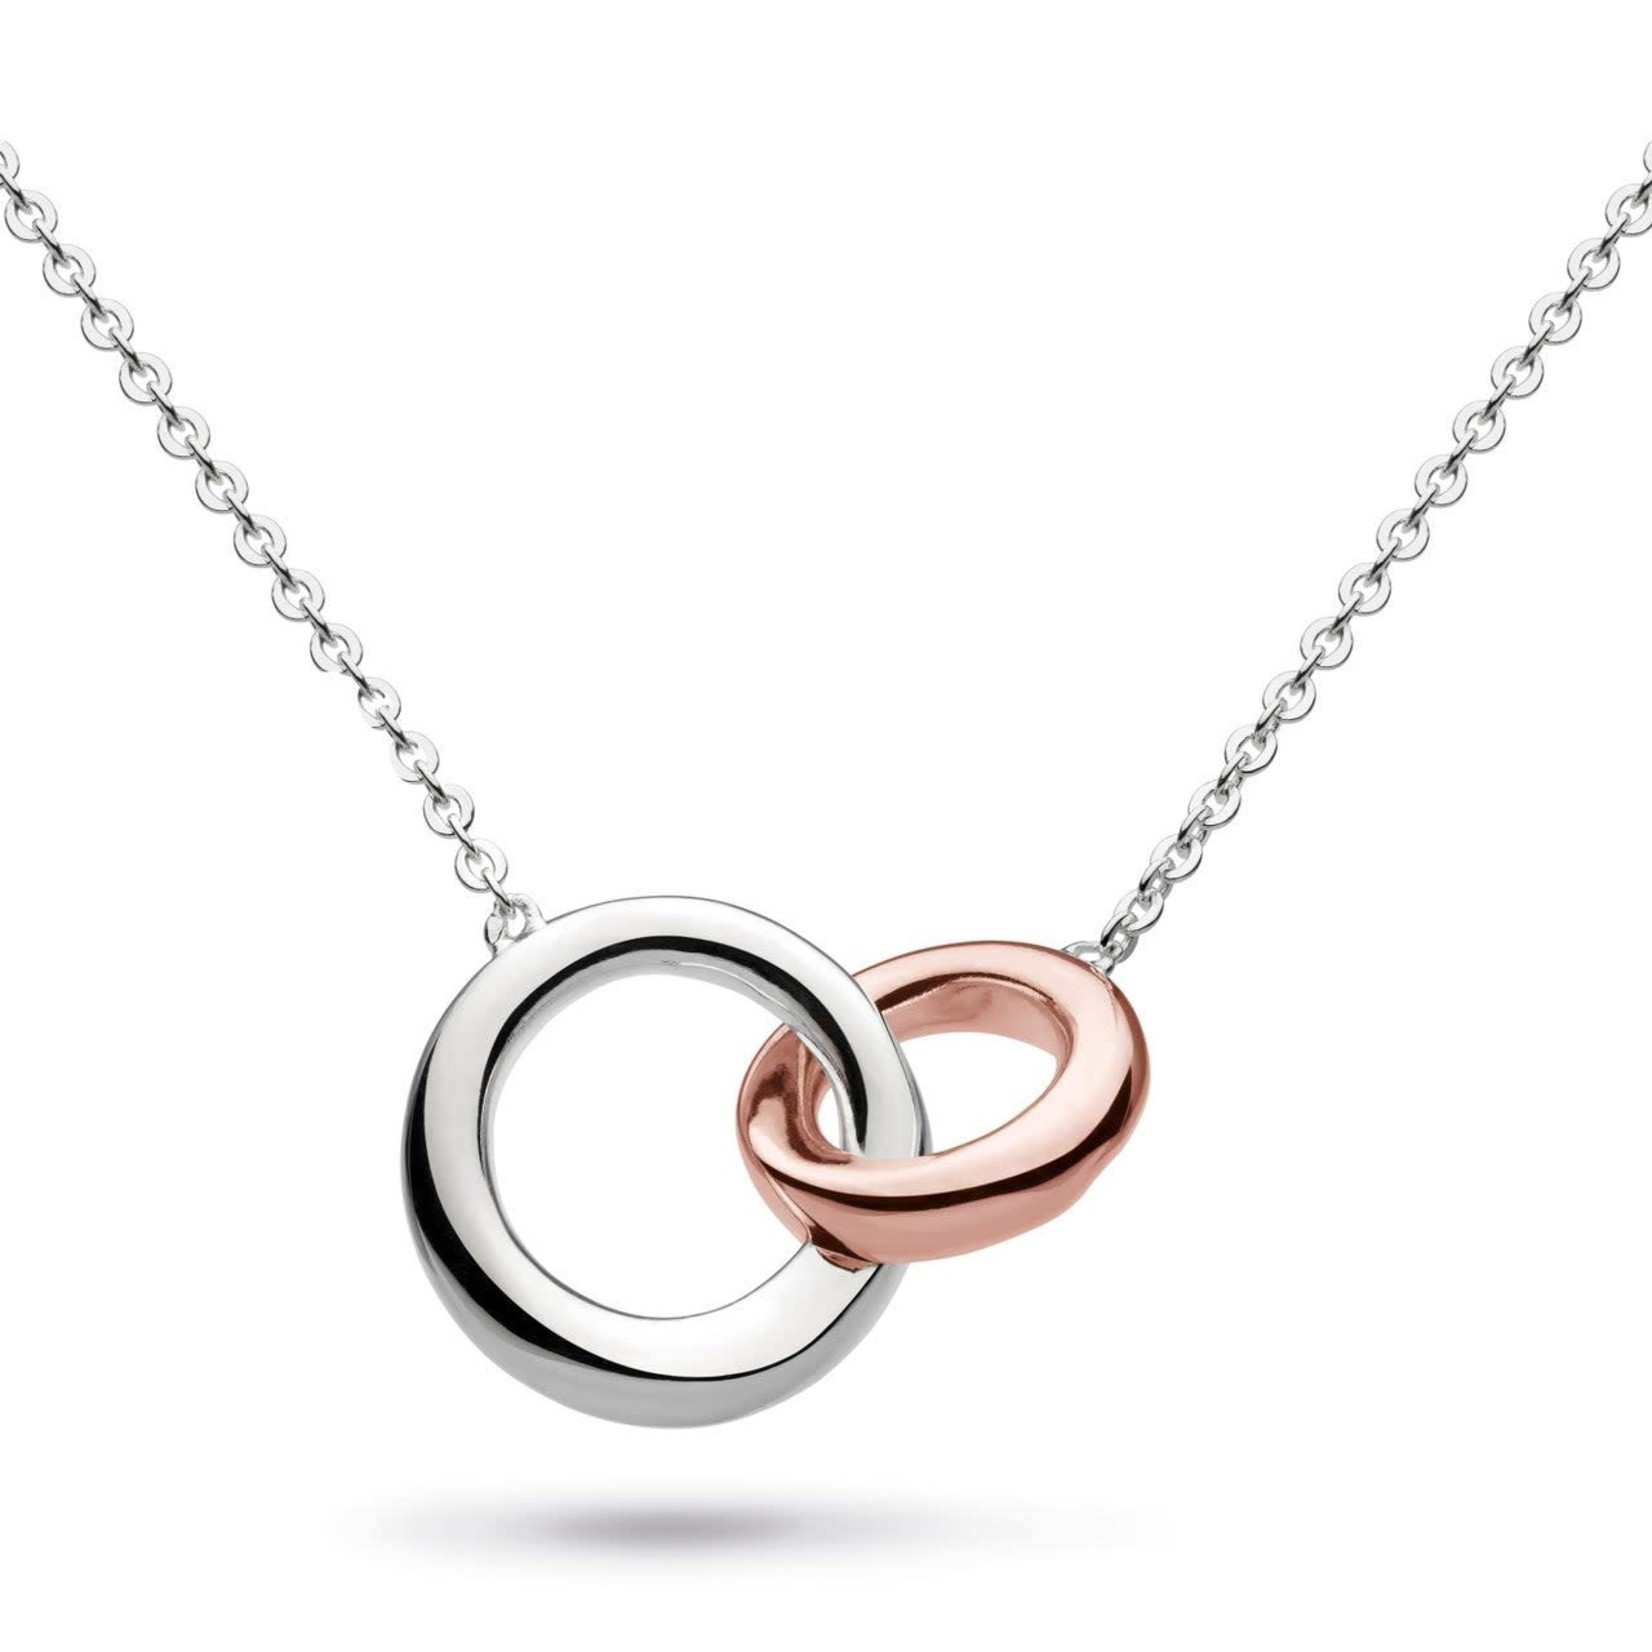 Bevel Cirque Link Rose Plate Necklace